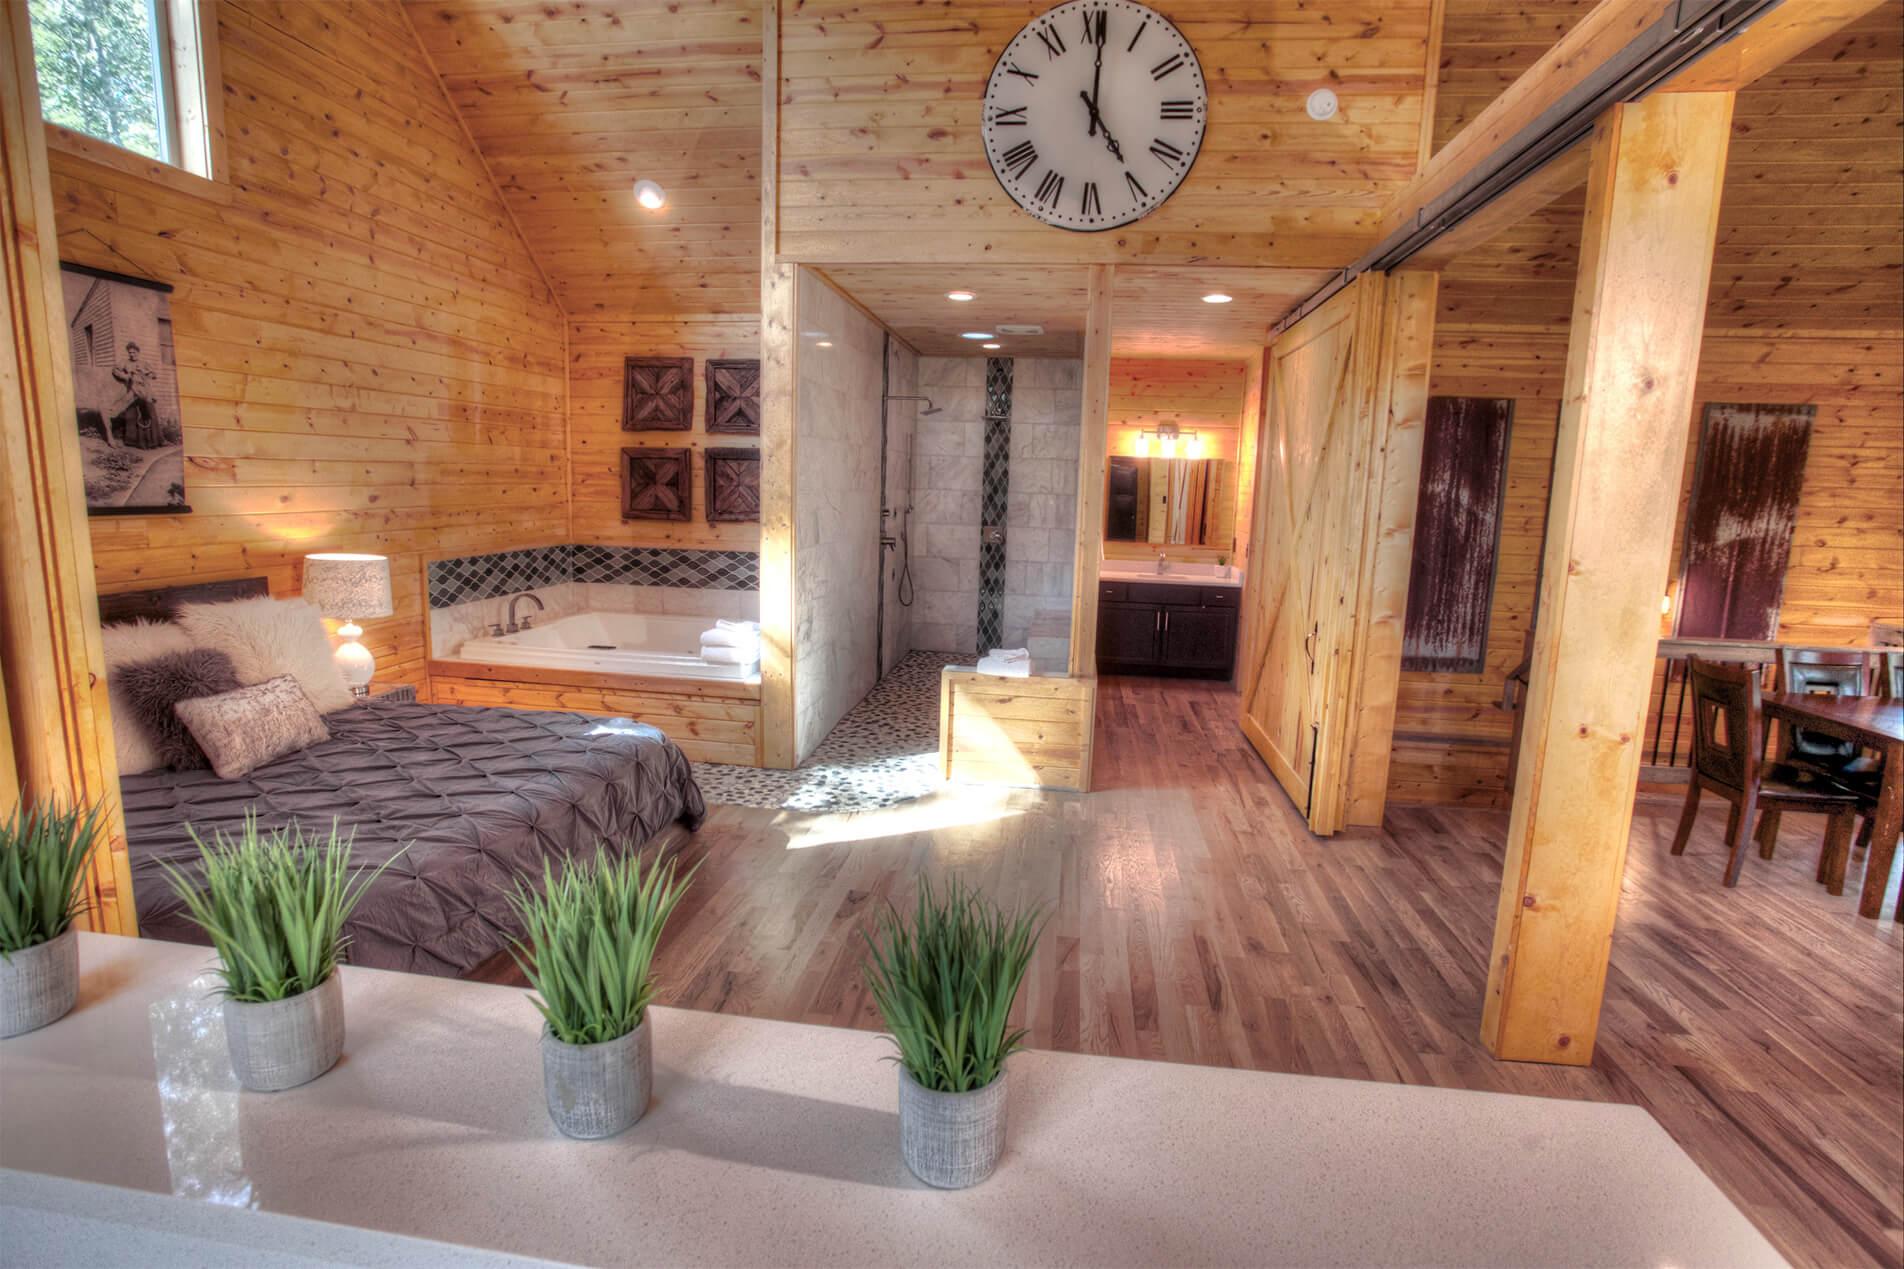 Tranquility-Cedar-Creek-Cabin-Rentals-Helen-Georgia-top-banner